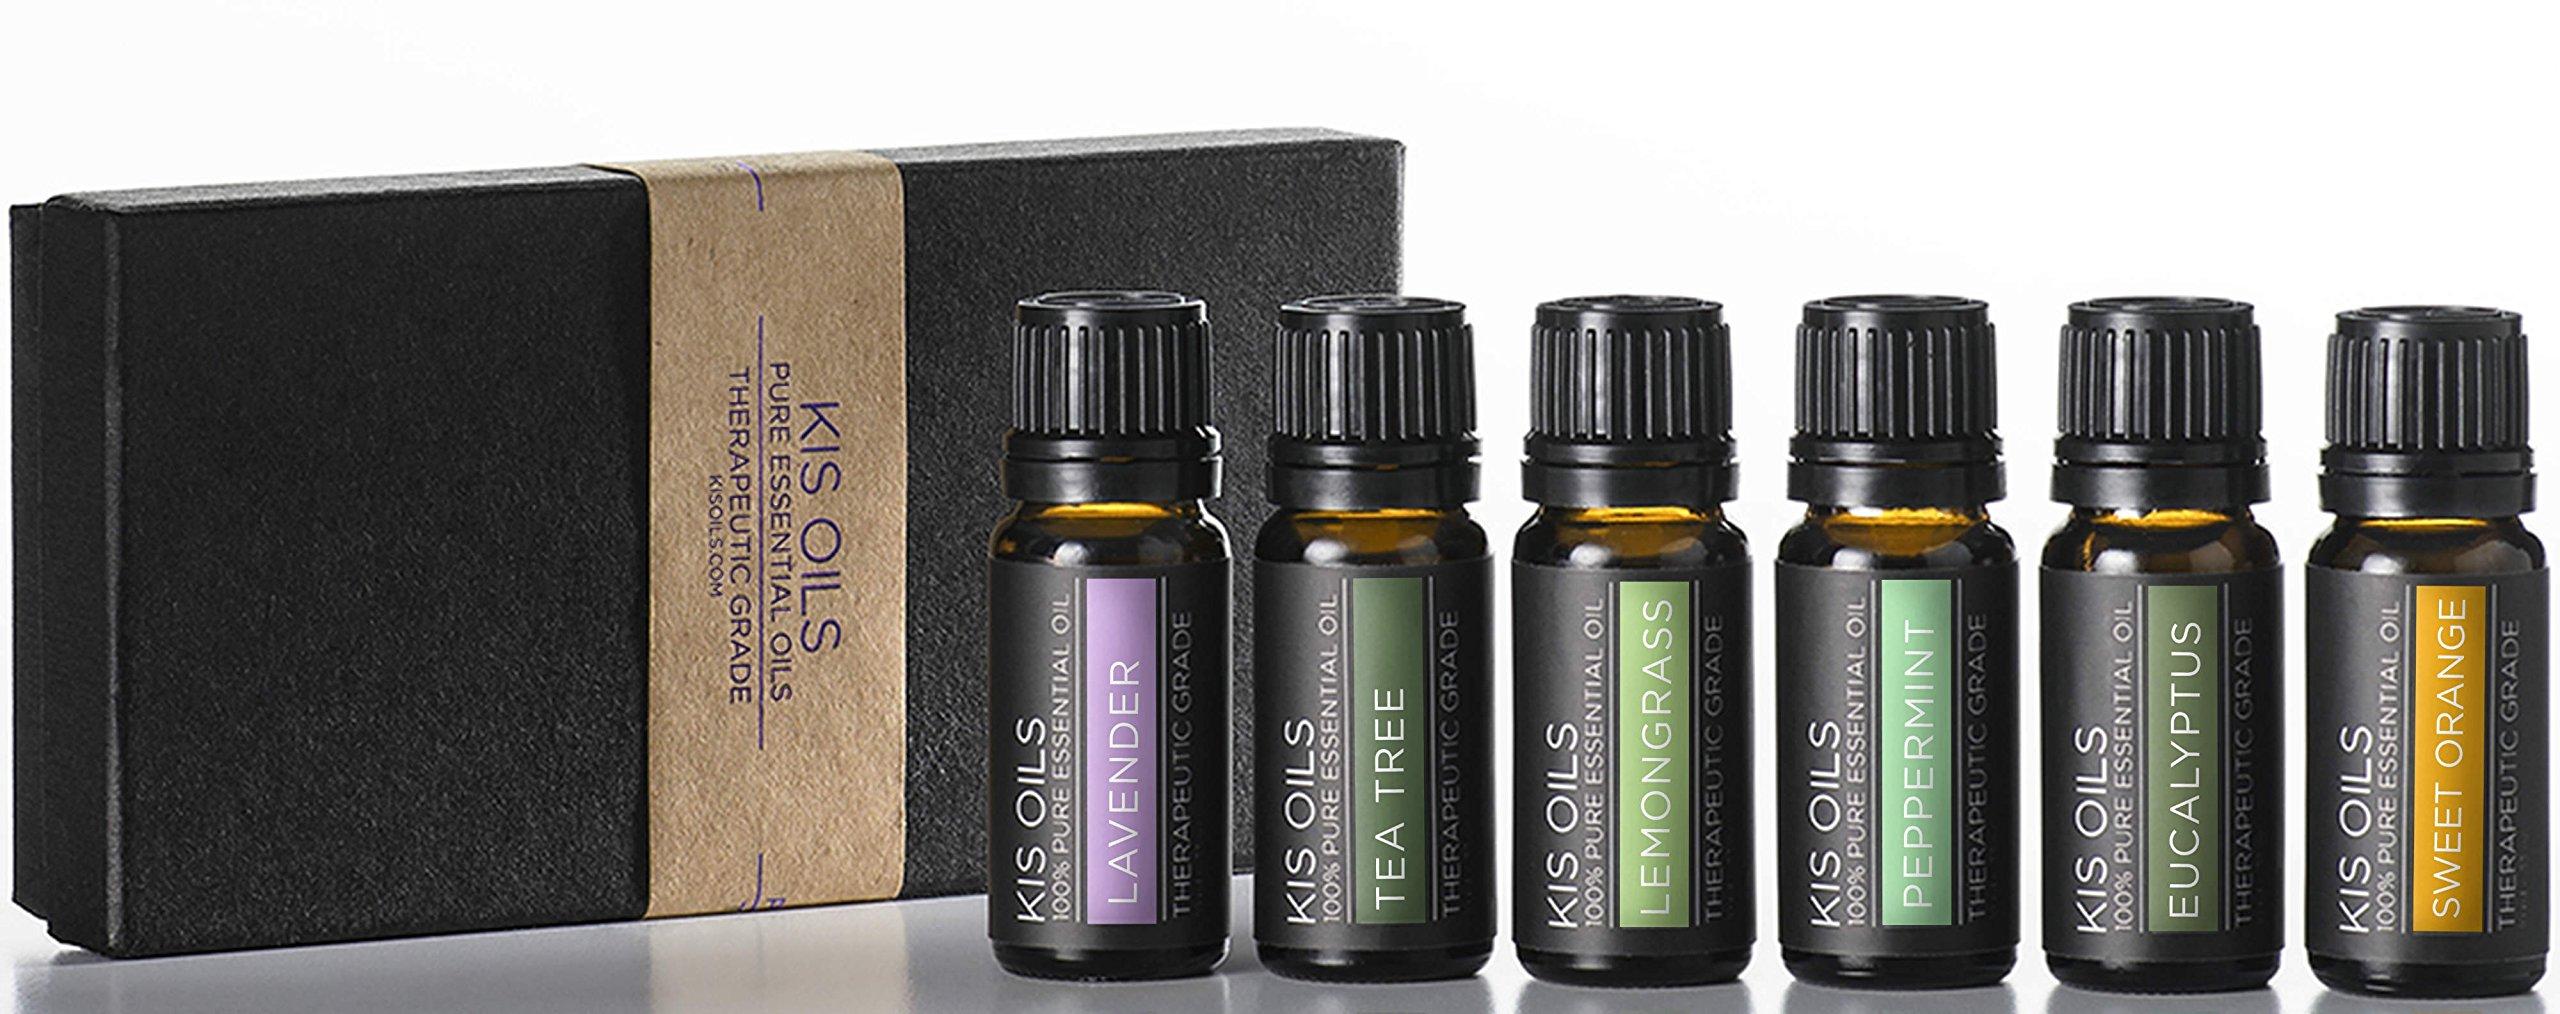 Aromatherapy Top 6 100% Pure Therapeutic Grade Basic Sampler Essential Oil Gift Basic sampler essential oil gift set 6/10ml (lavender, sweet orange, peppermint, lemongrass, tea tree, eucalyptus) by Kis Oil'S (Image #2)